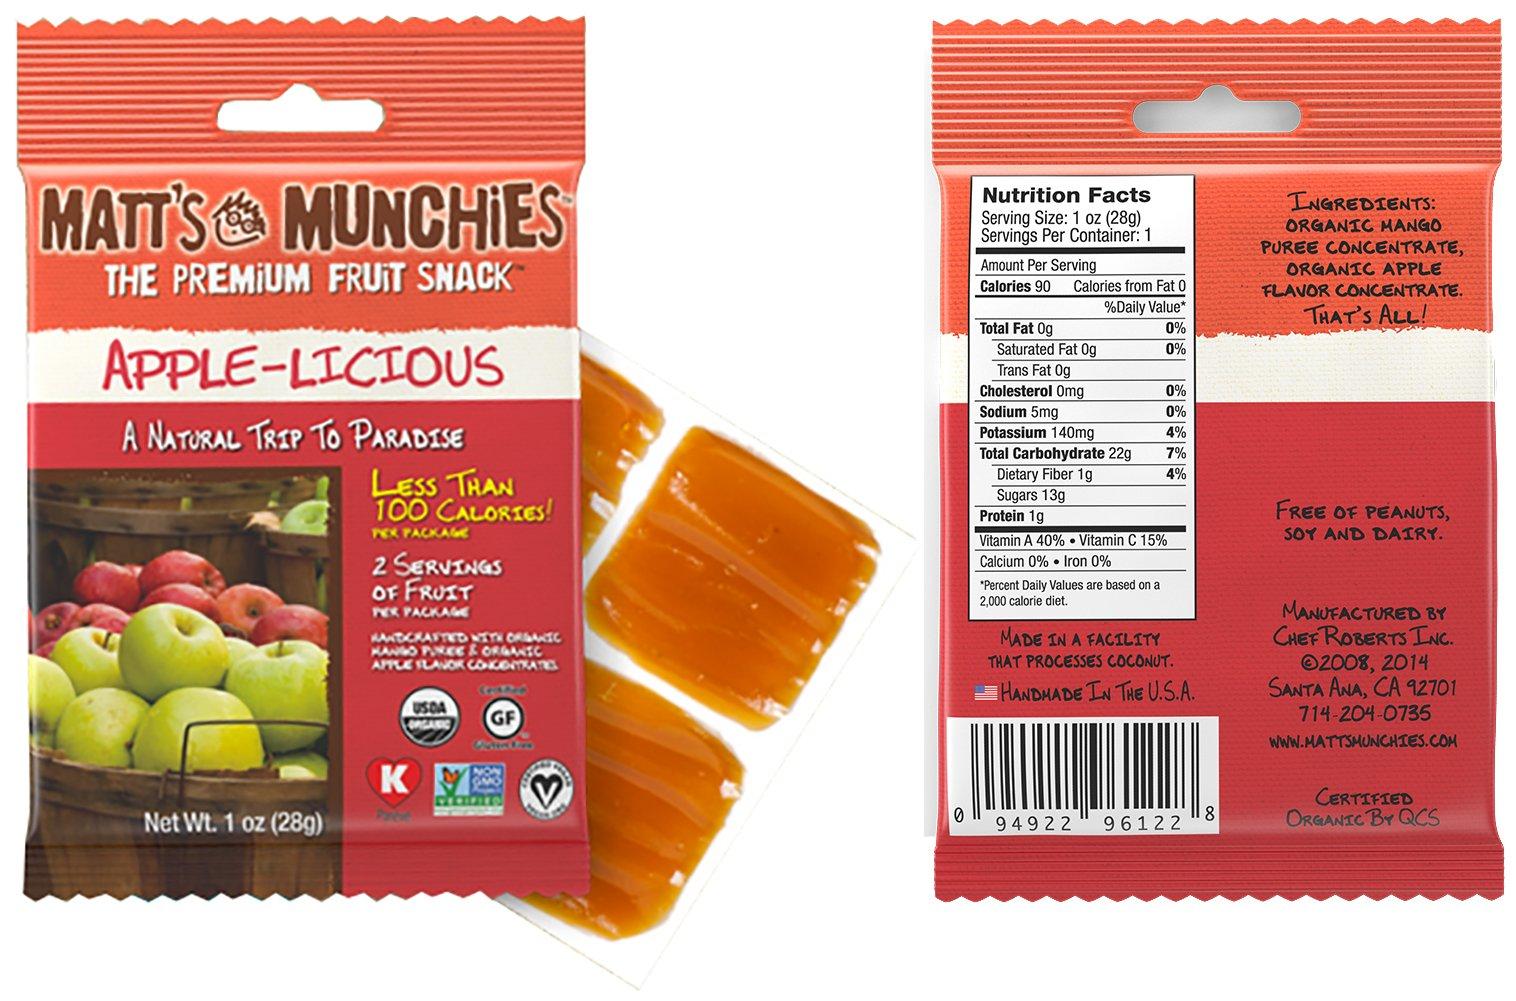 Matt's Munchies Tropical Assortment Organic Non-GMO Fruit Leather Peelable Fruit Snacks 25 Count Variety Pack Caddy - Mango, Island Mango, Tropical Punch, Banana Coconut & Apple by Matt's Munchies (Image #2)